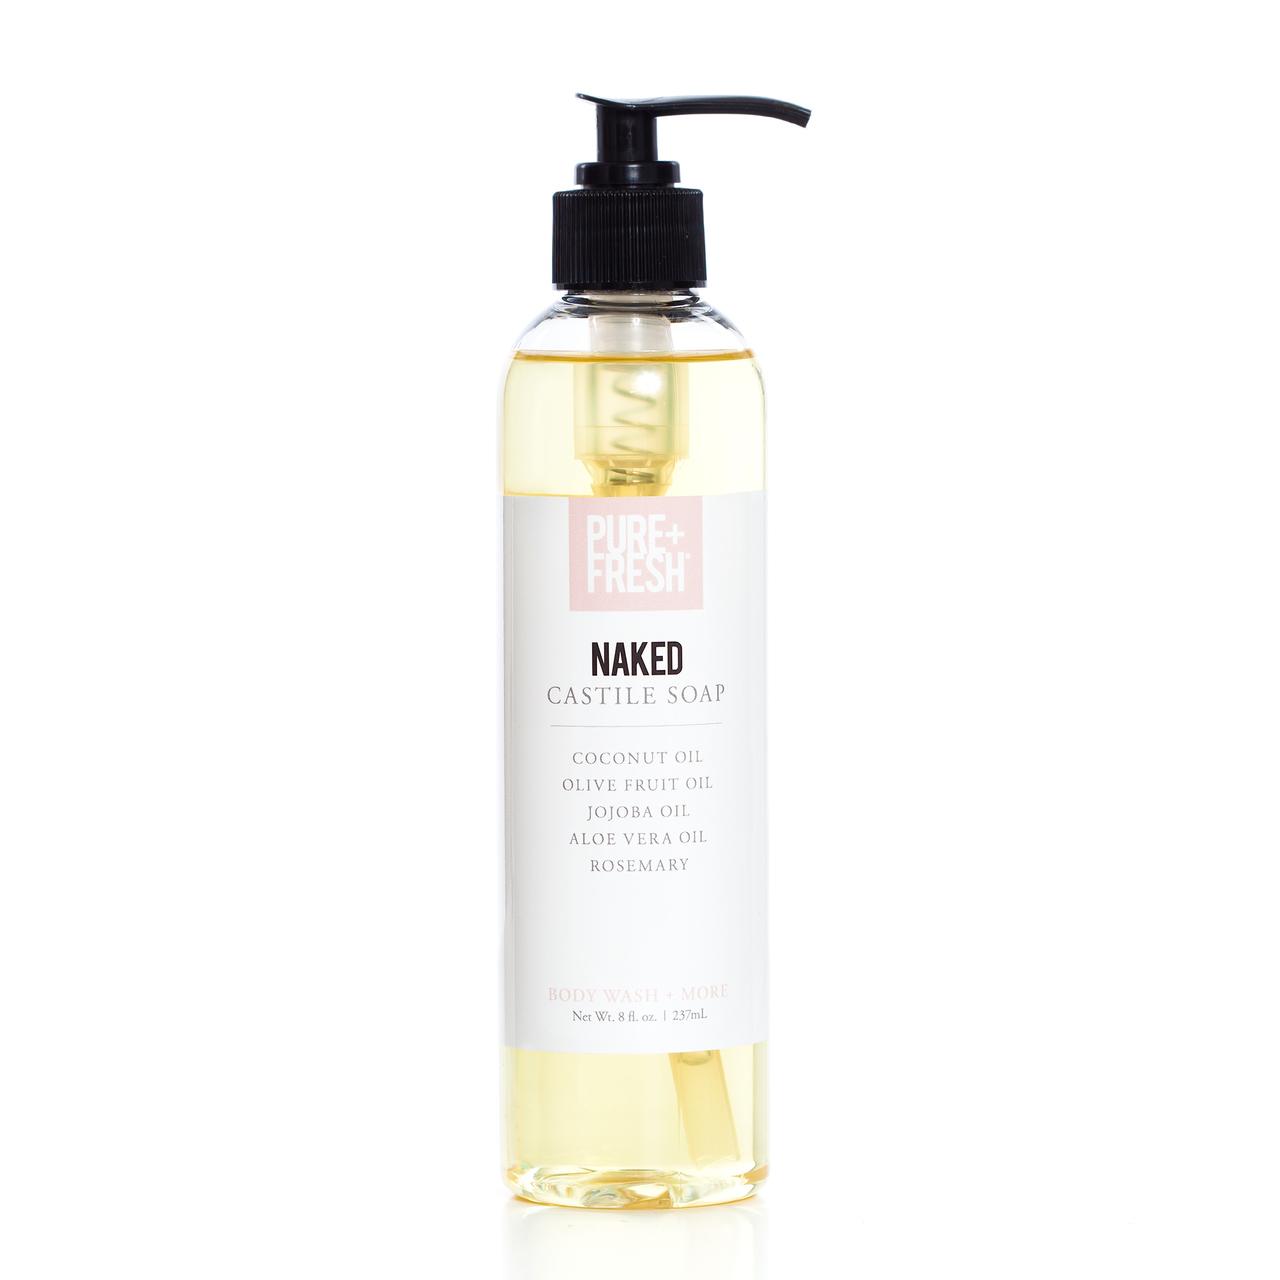 8oz bottle of fragrance free Castile Soap